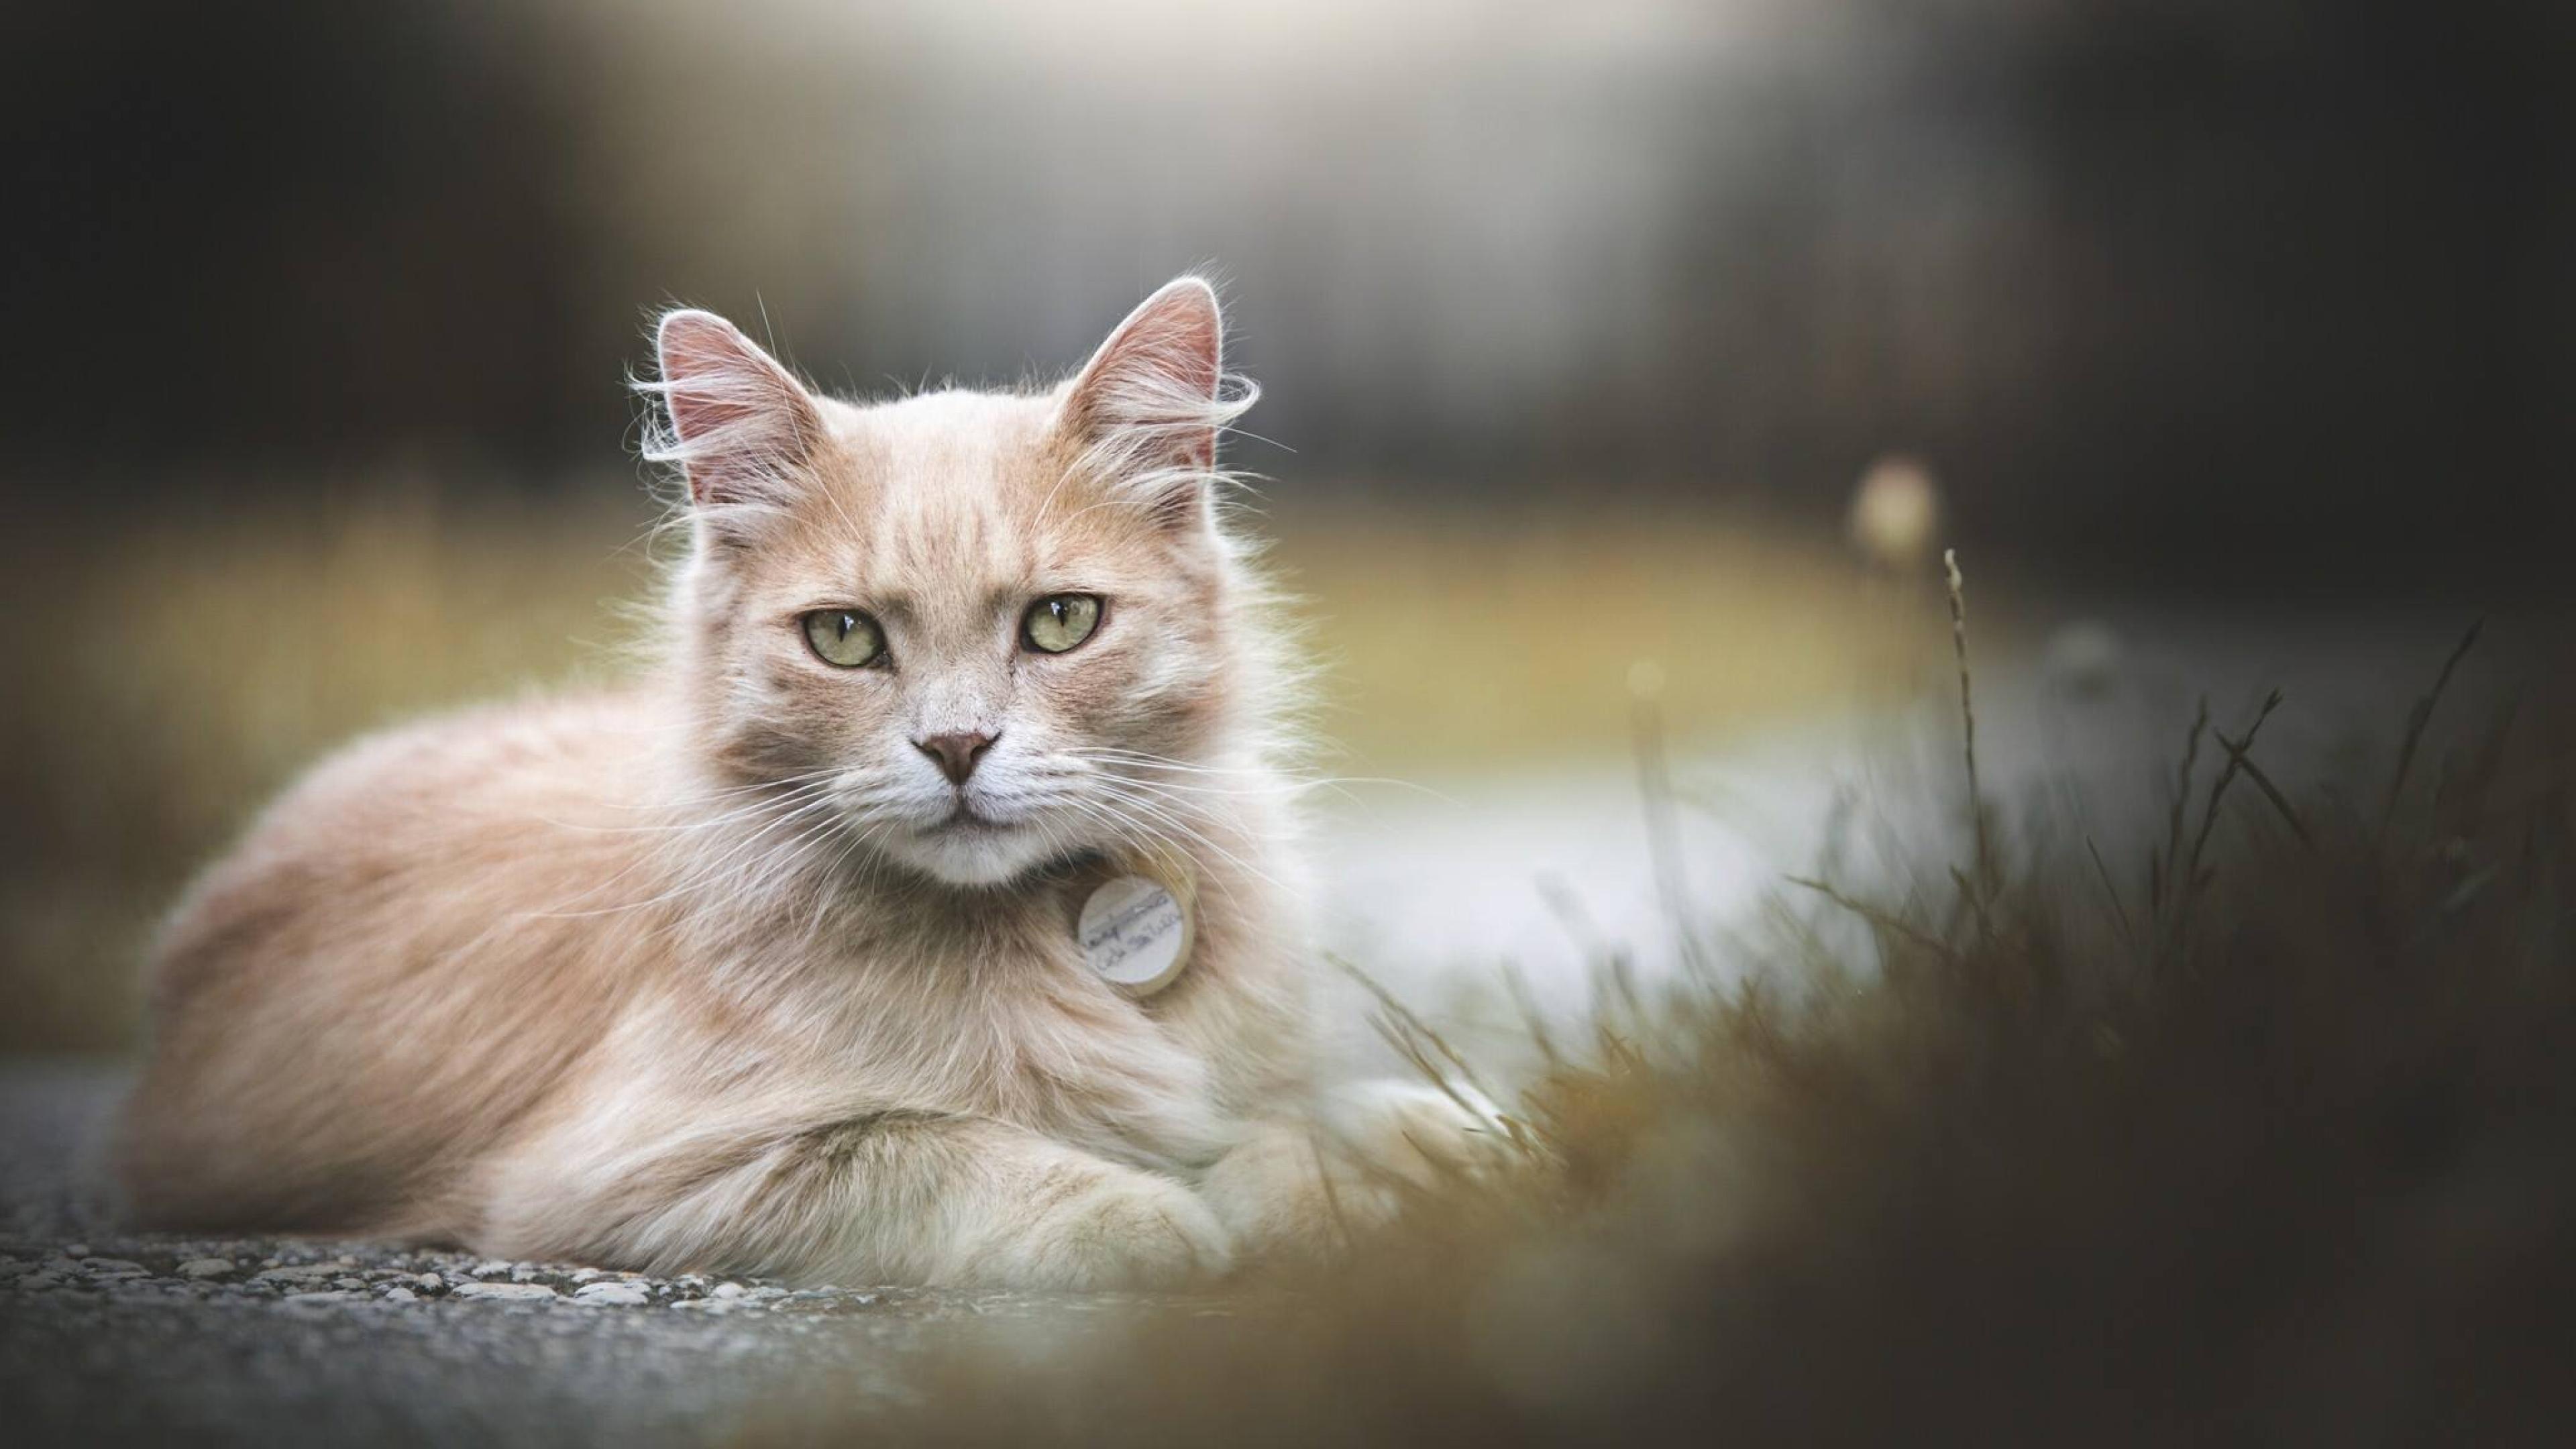 https://www.zastavki.com/pictures/originals/2019Animals___Cats_Ginger_green-eyed_cat_lying_on_the_ground_133833_.jpg